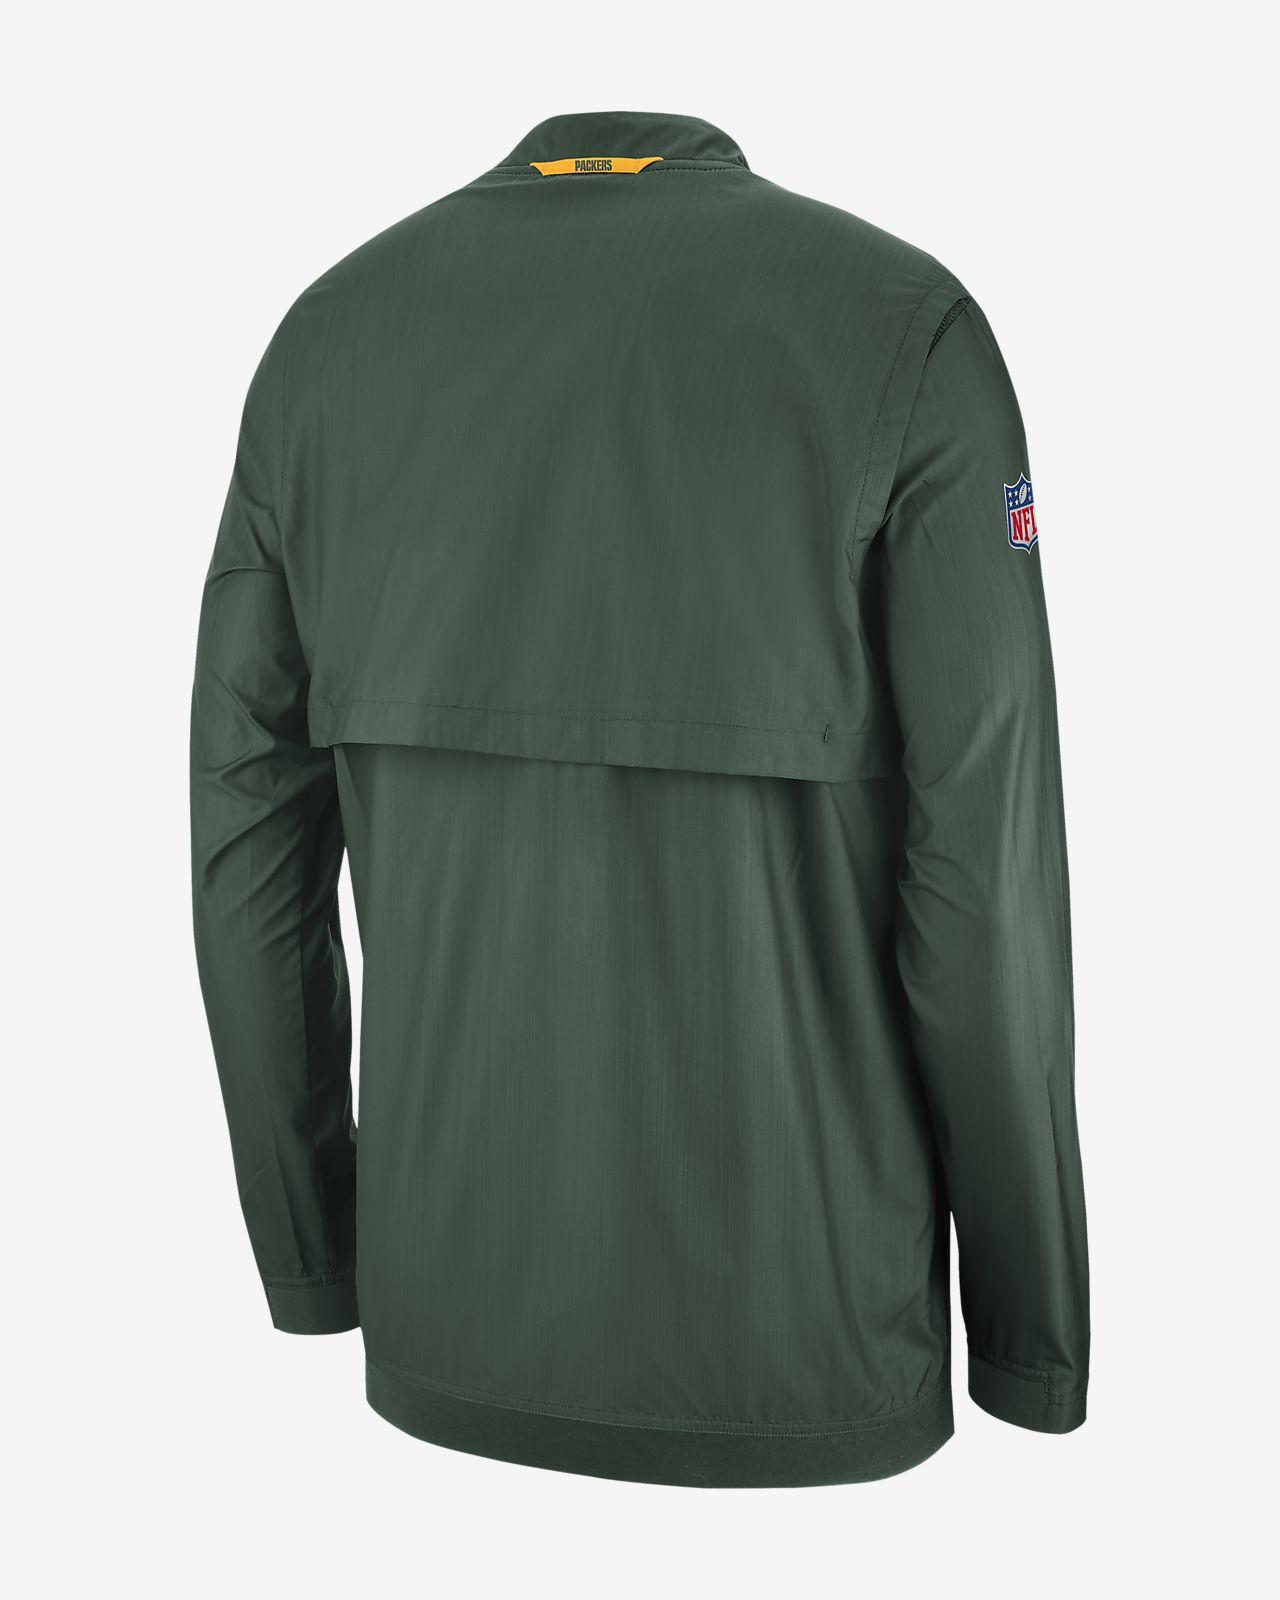 a526d1a7bc91 Nike Lockdown (NFL Packers) Men s Half-Zip Jacket. Nike.com